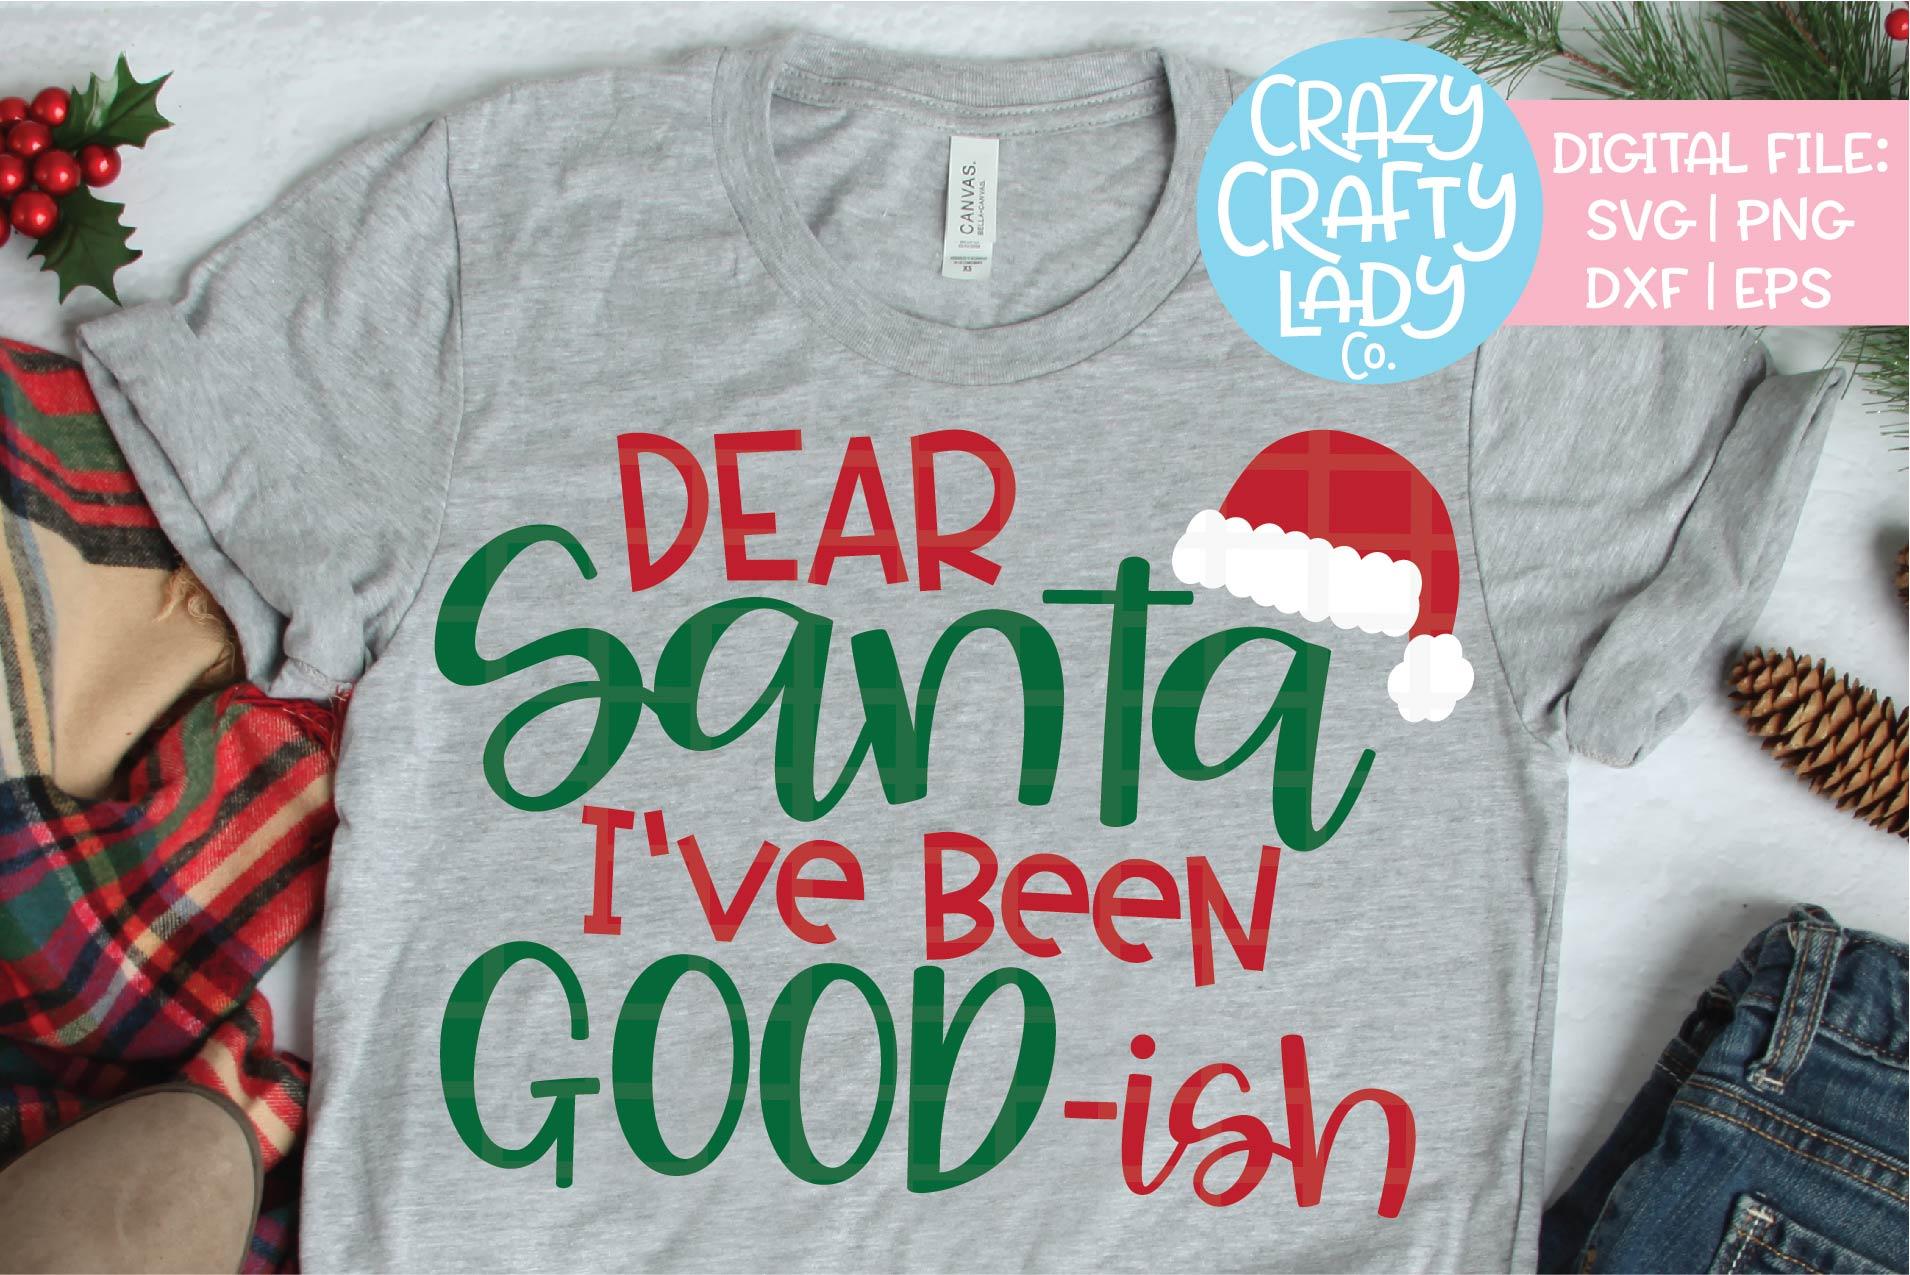 Dear Santa I've Been Good-ish SVG DXF EPS PNG Cut File example image 1